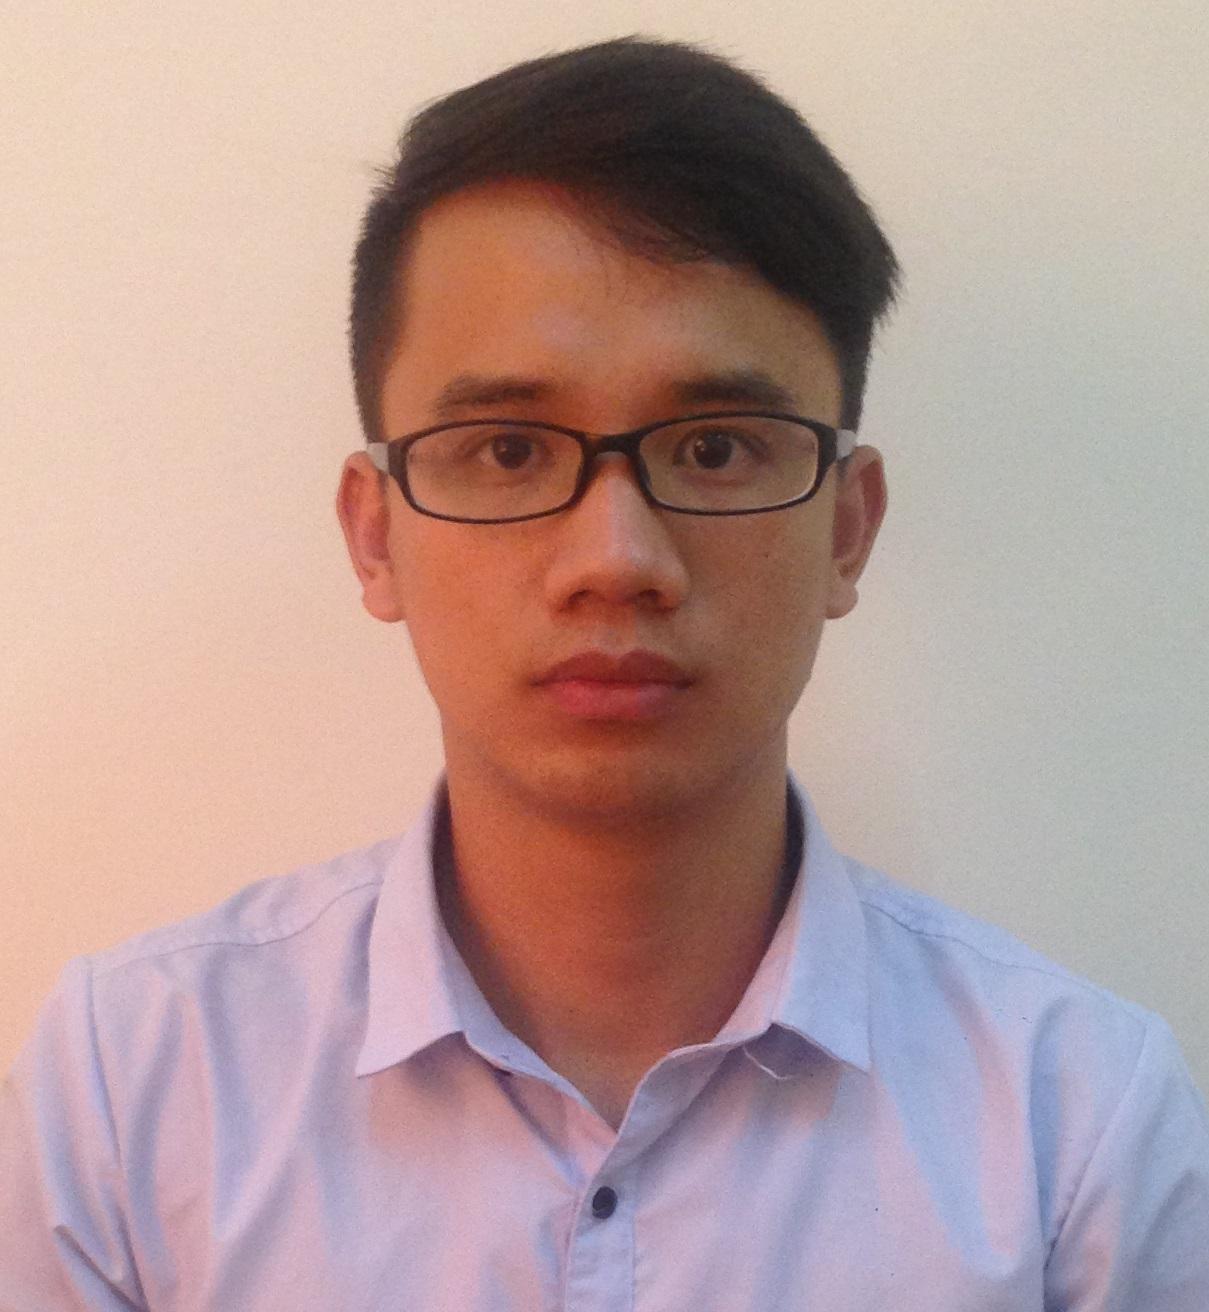 Nguyễn Trường Giang